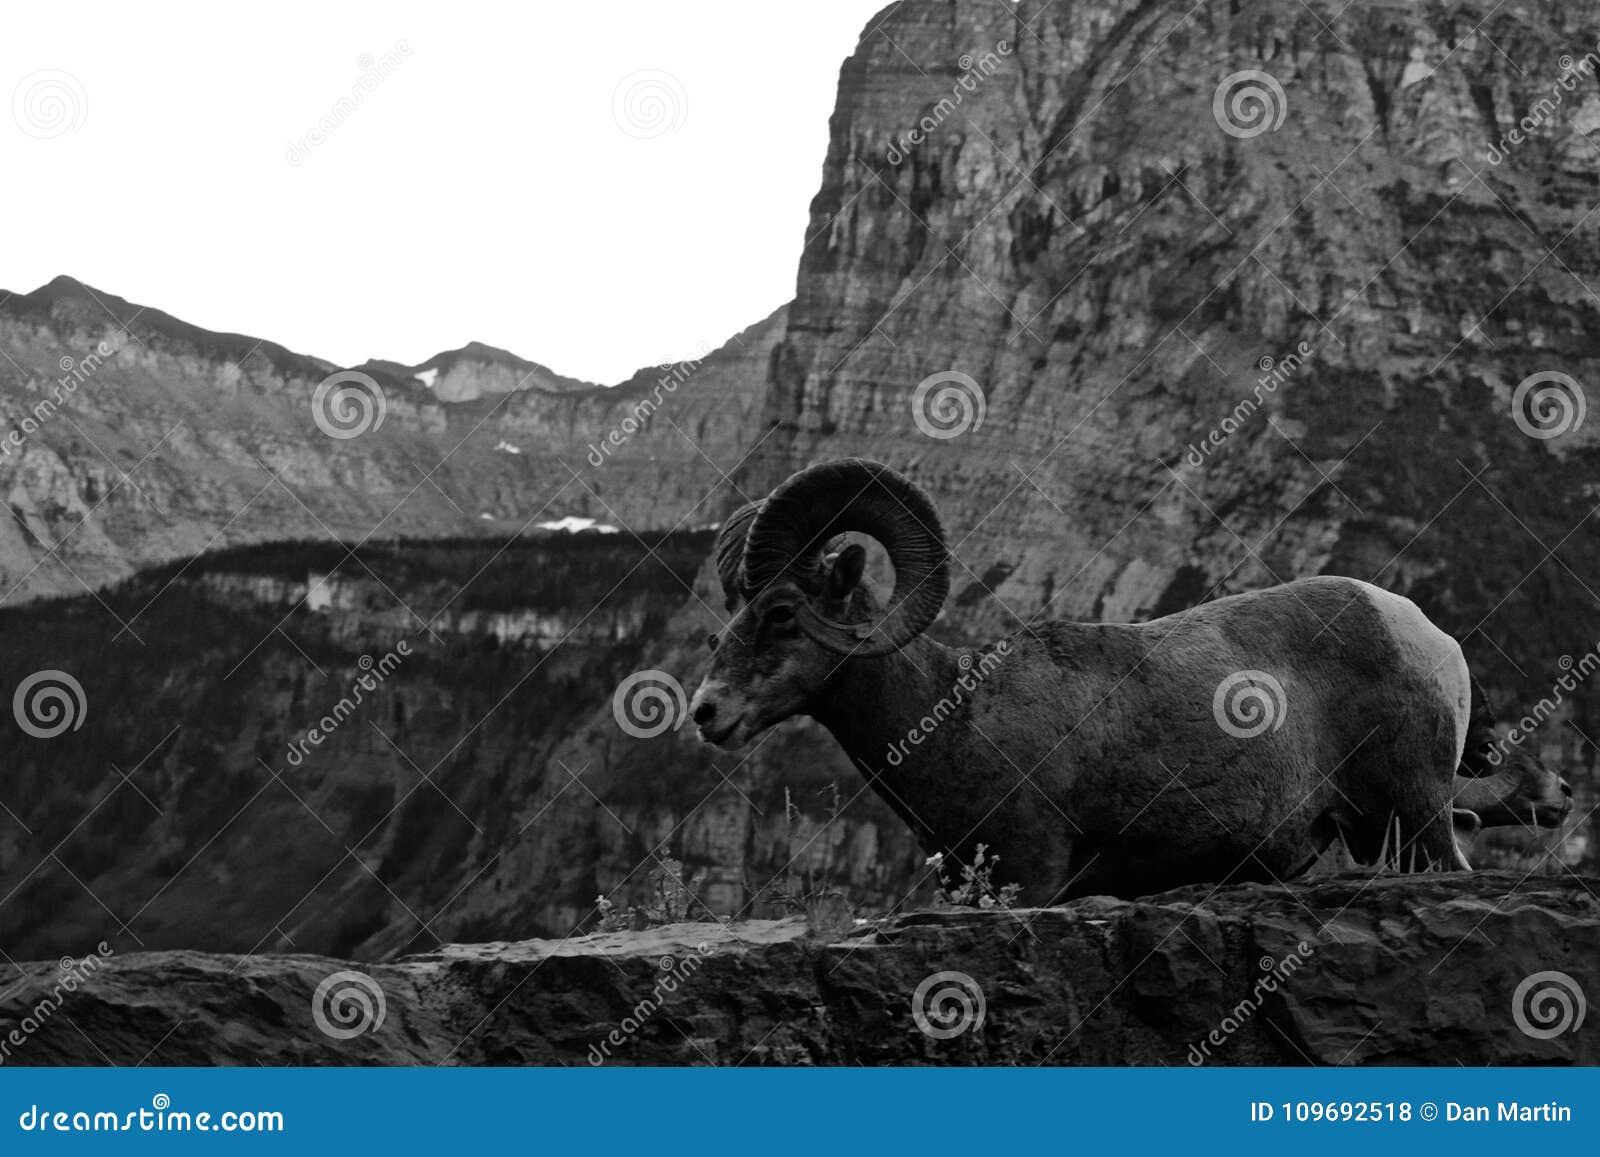 Zwart-wit Landschap van Rocky Mountain Bighorn Sheep